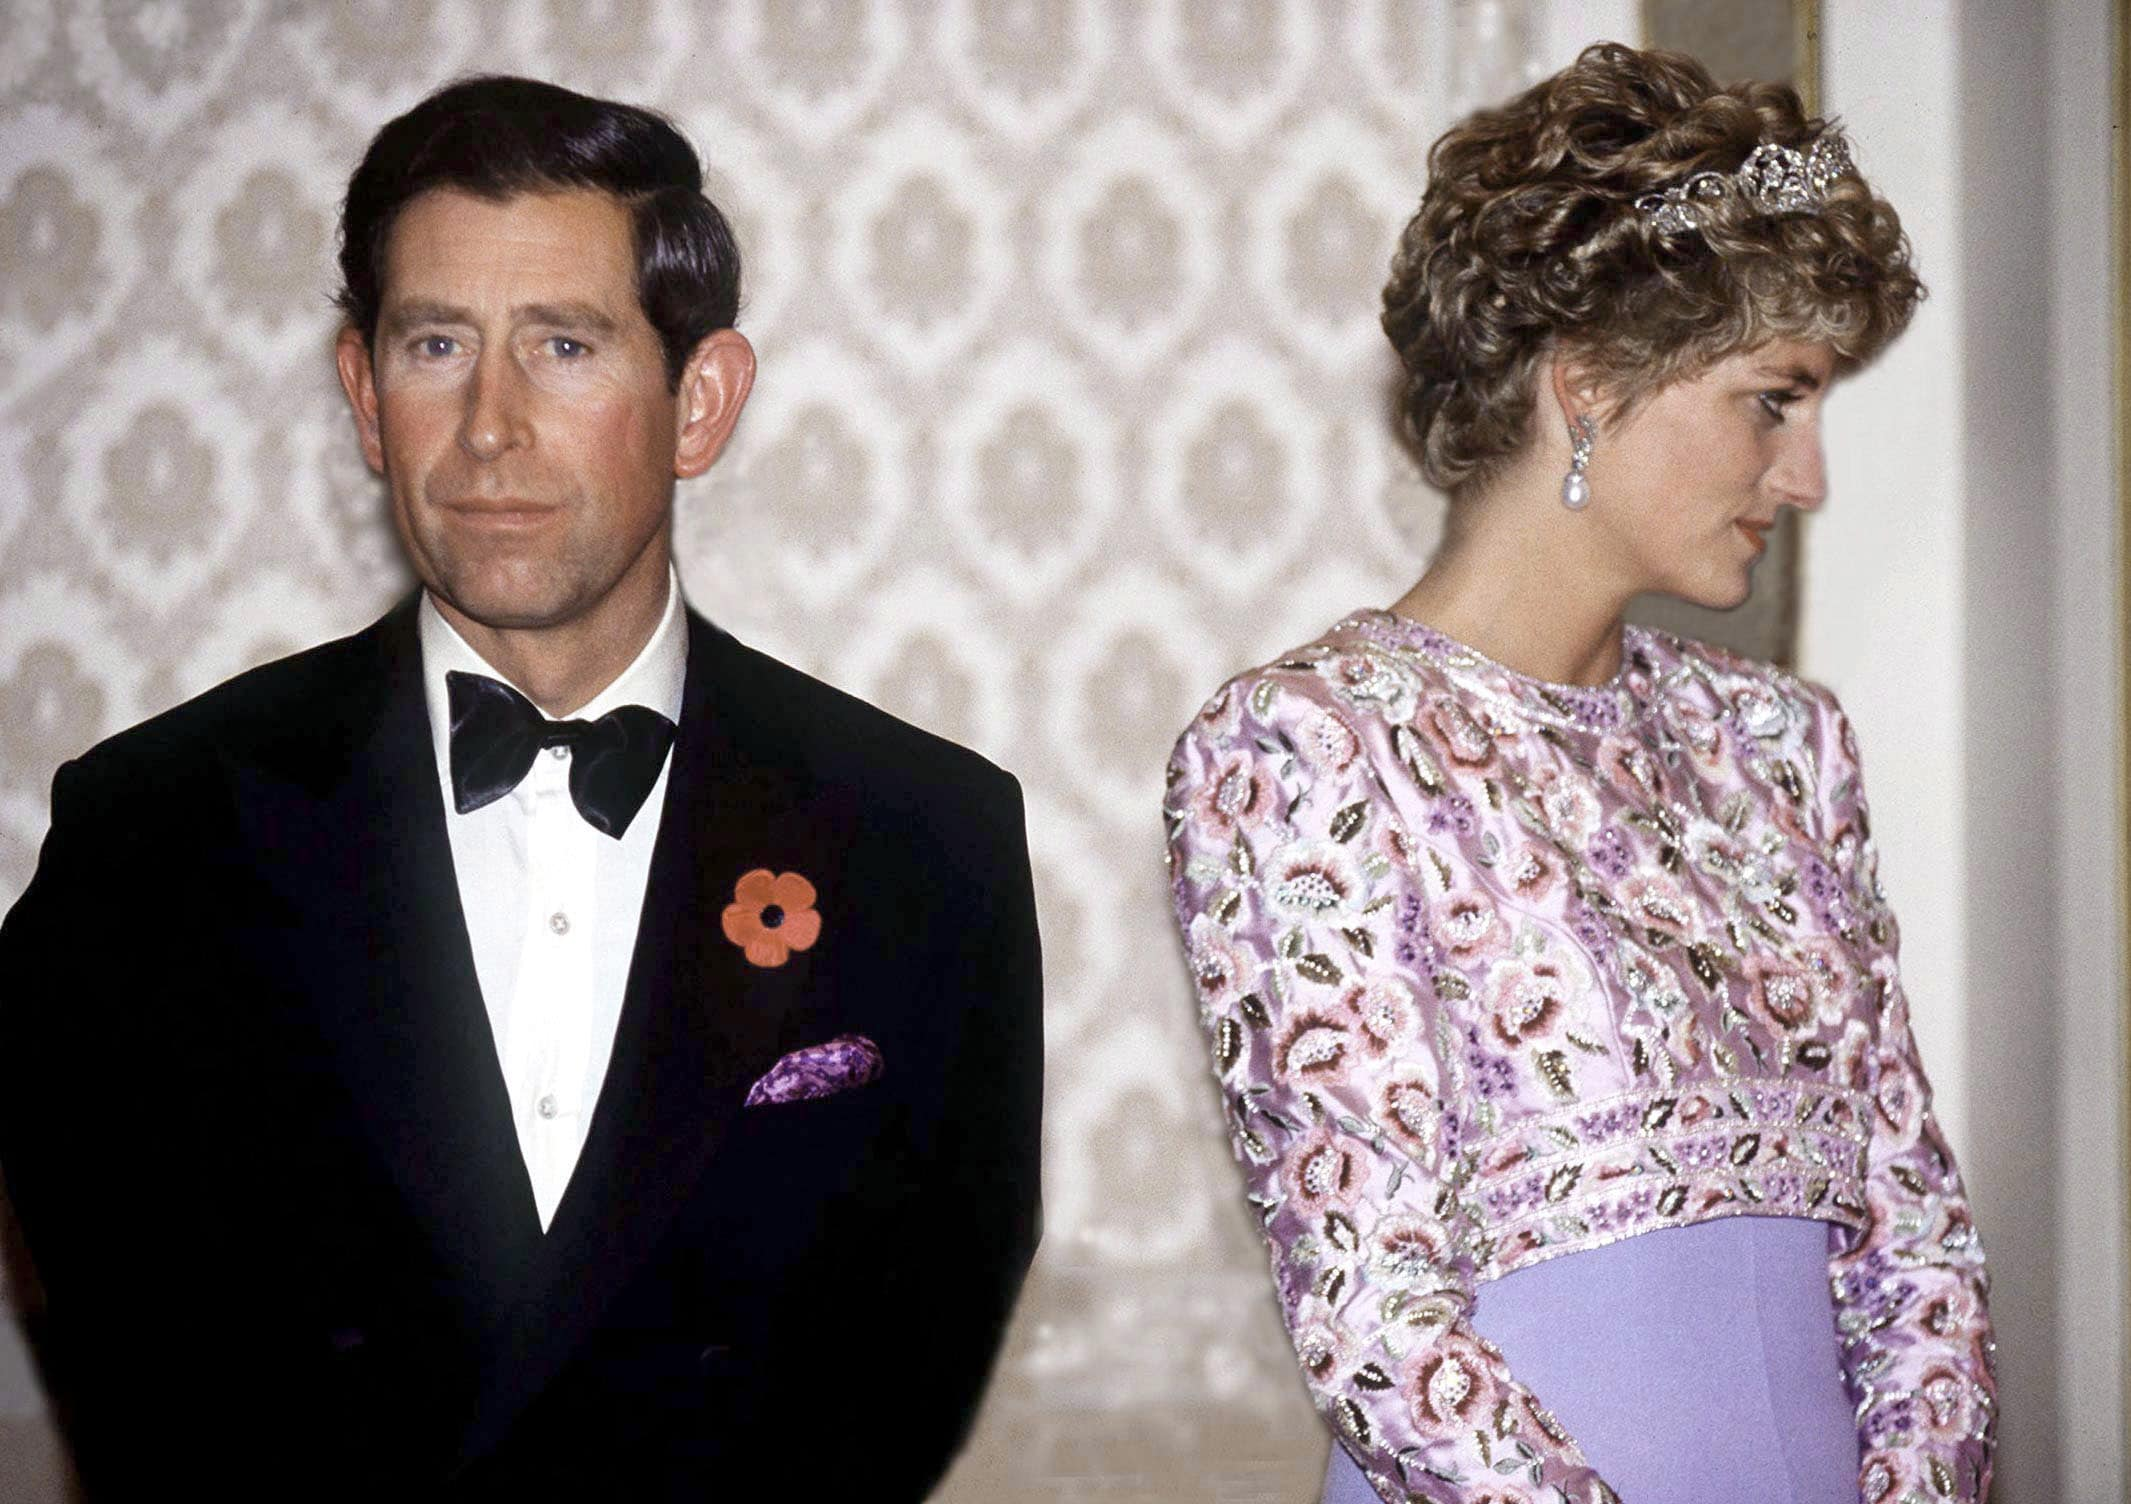 prince charles and princess diana looking unhappy